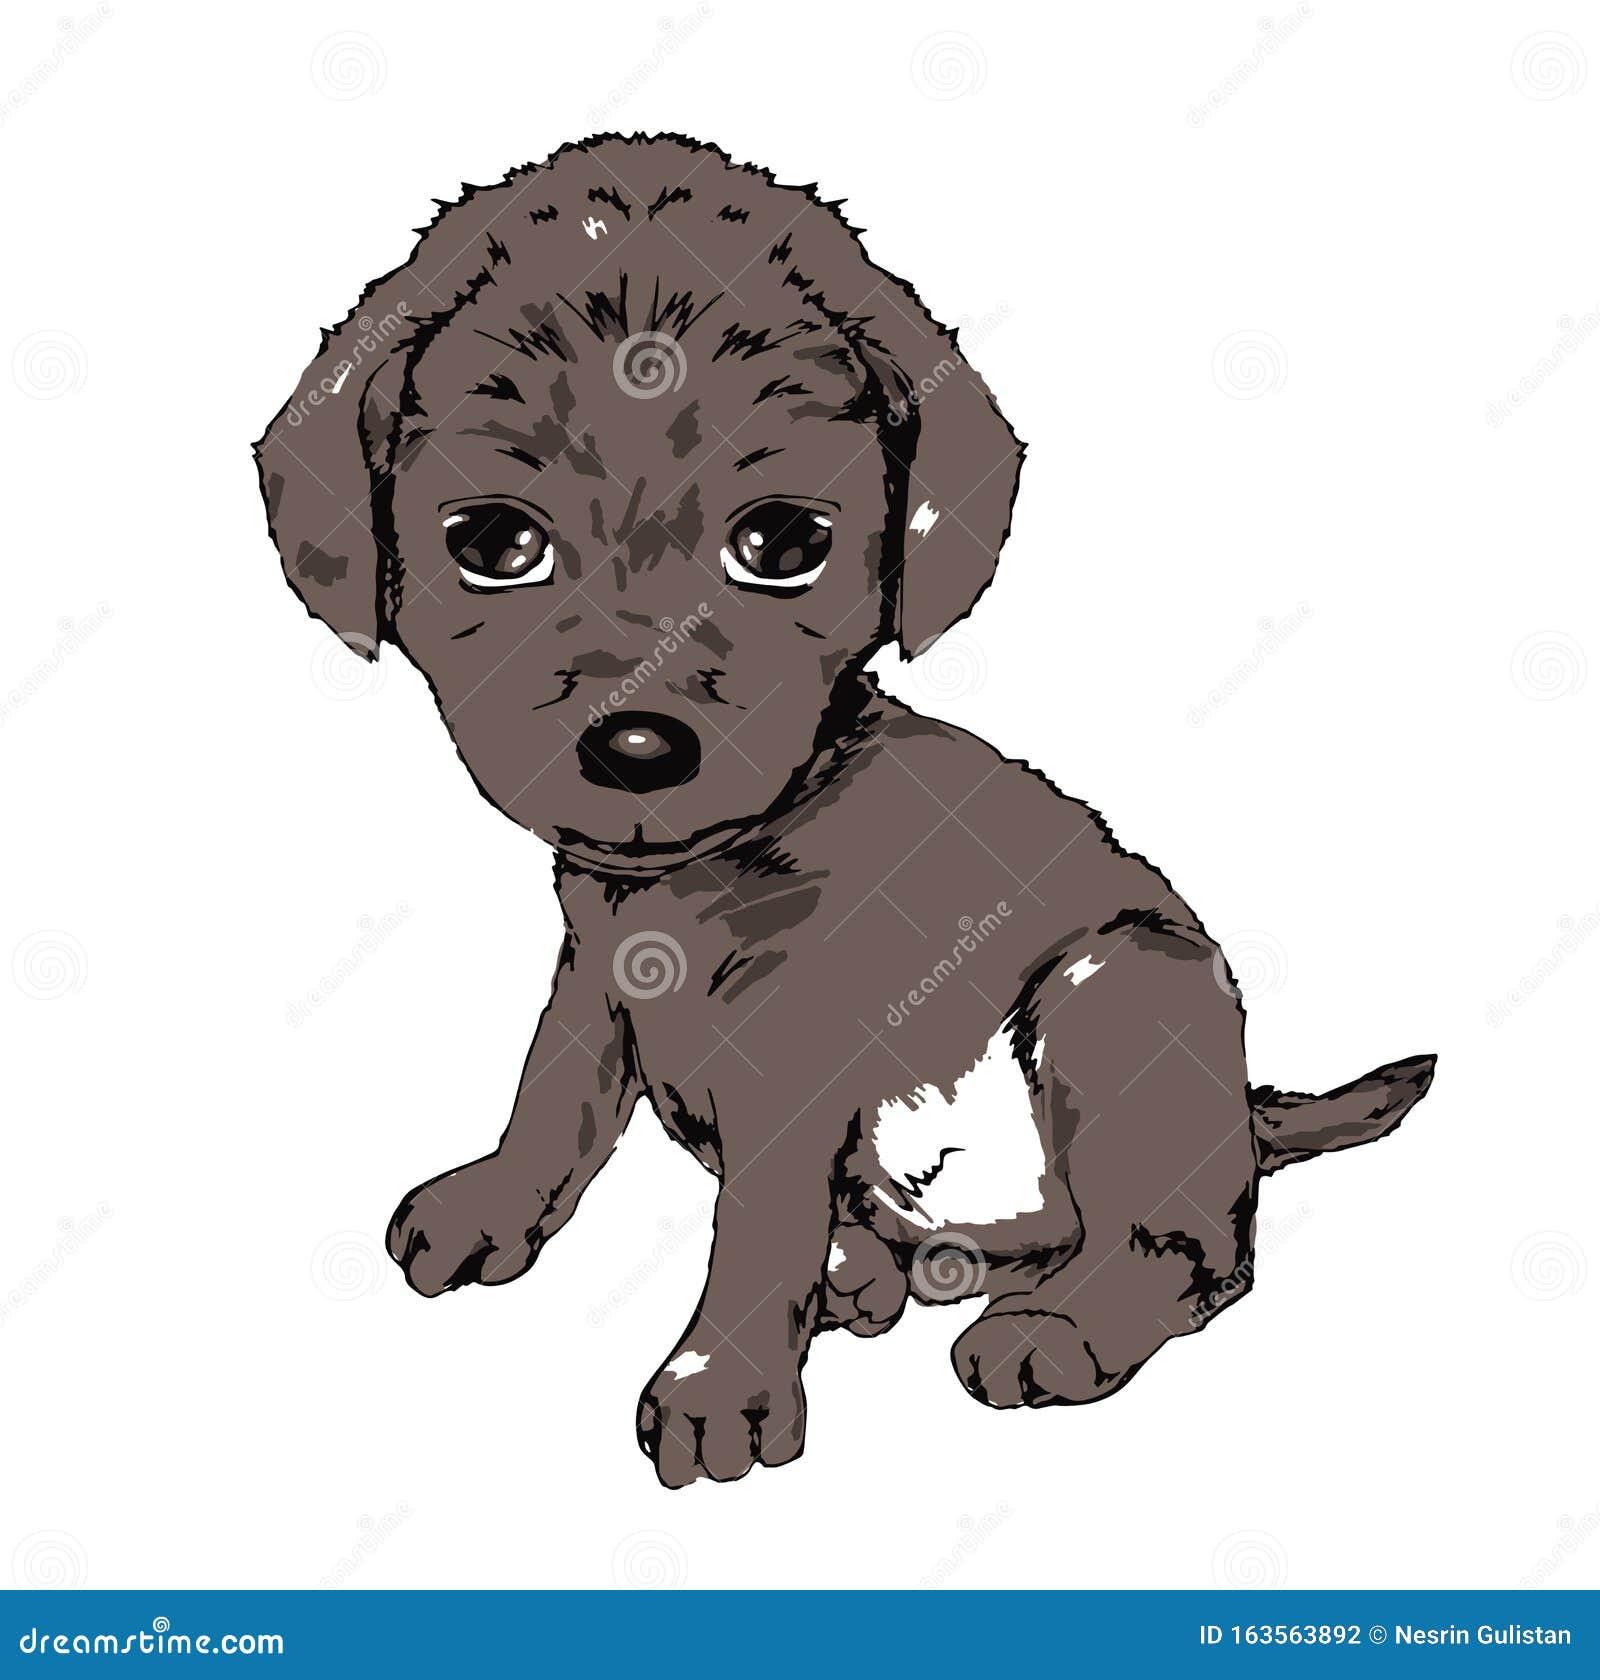 Cute Little Puppy Cute Animal Pet Animal Owner Dog Tiny Cute Animal Cute Faithful Tiny Animal Friendly Illustration Stock Illustration Illustration Of Friendly Little 163563892